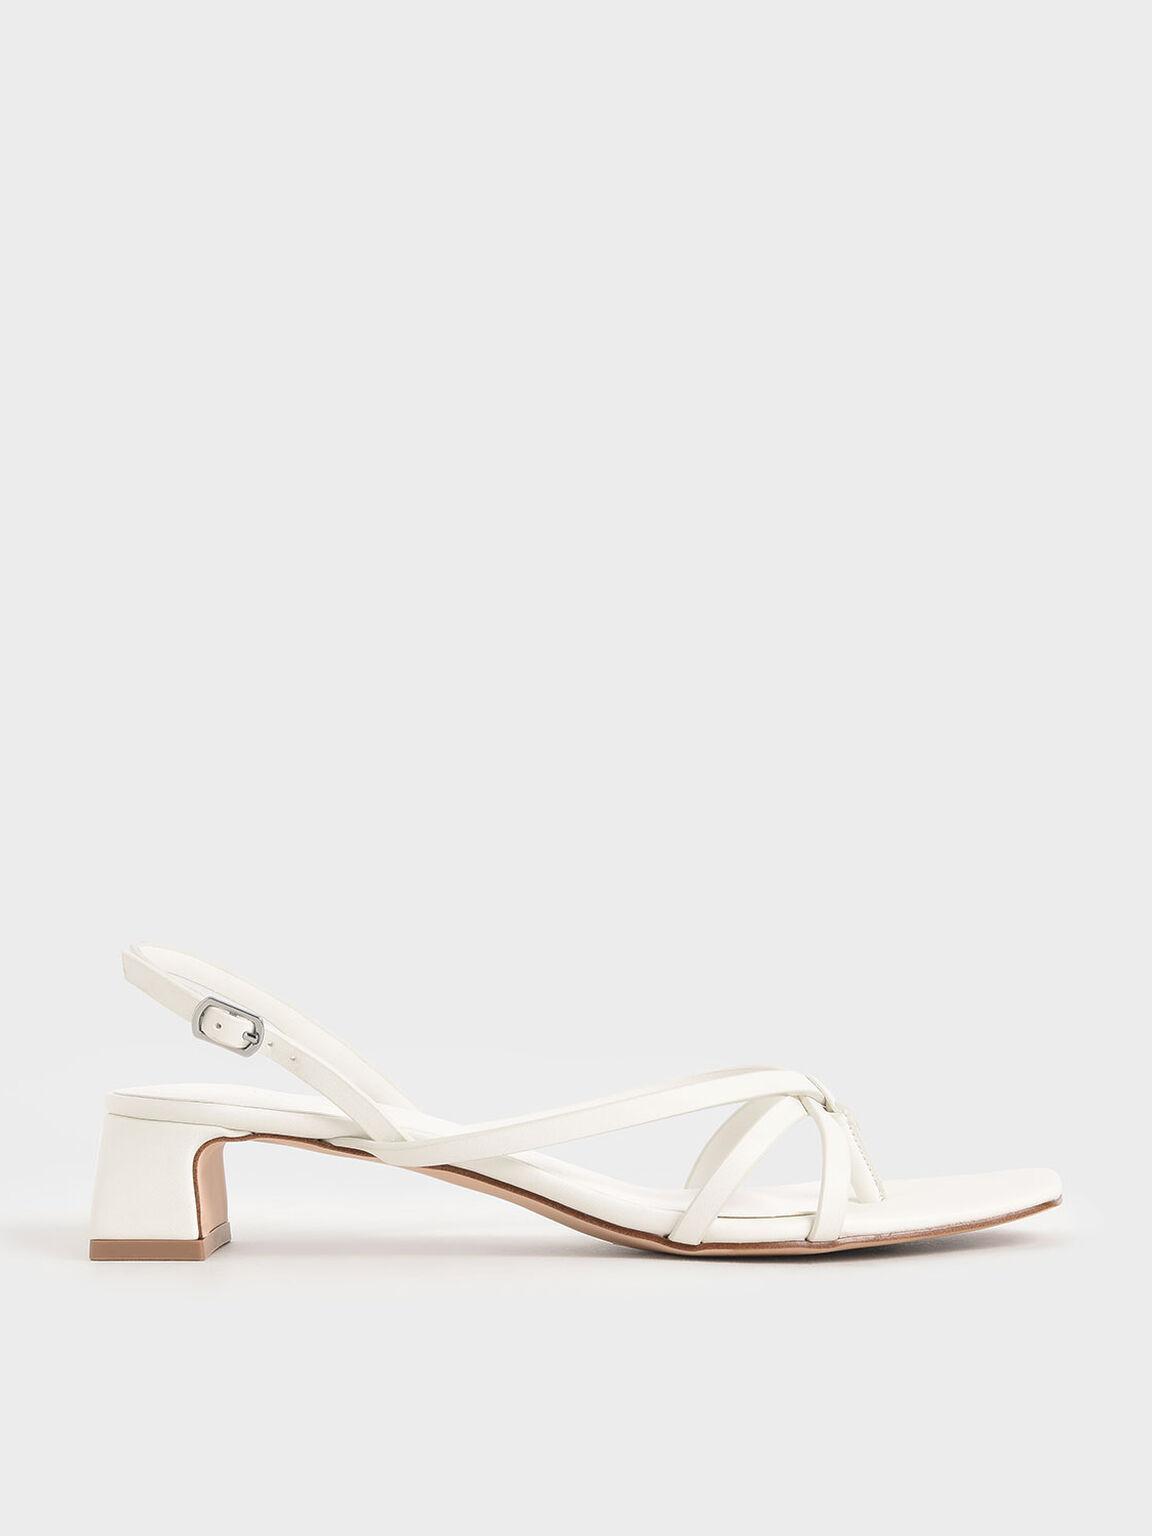 Strappy Sandals, White, hi-res